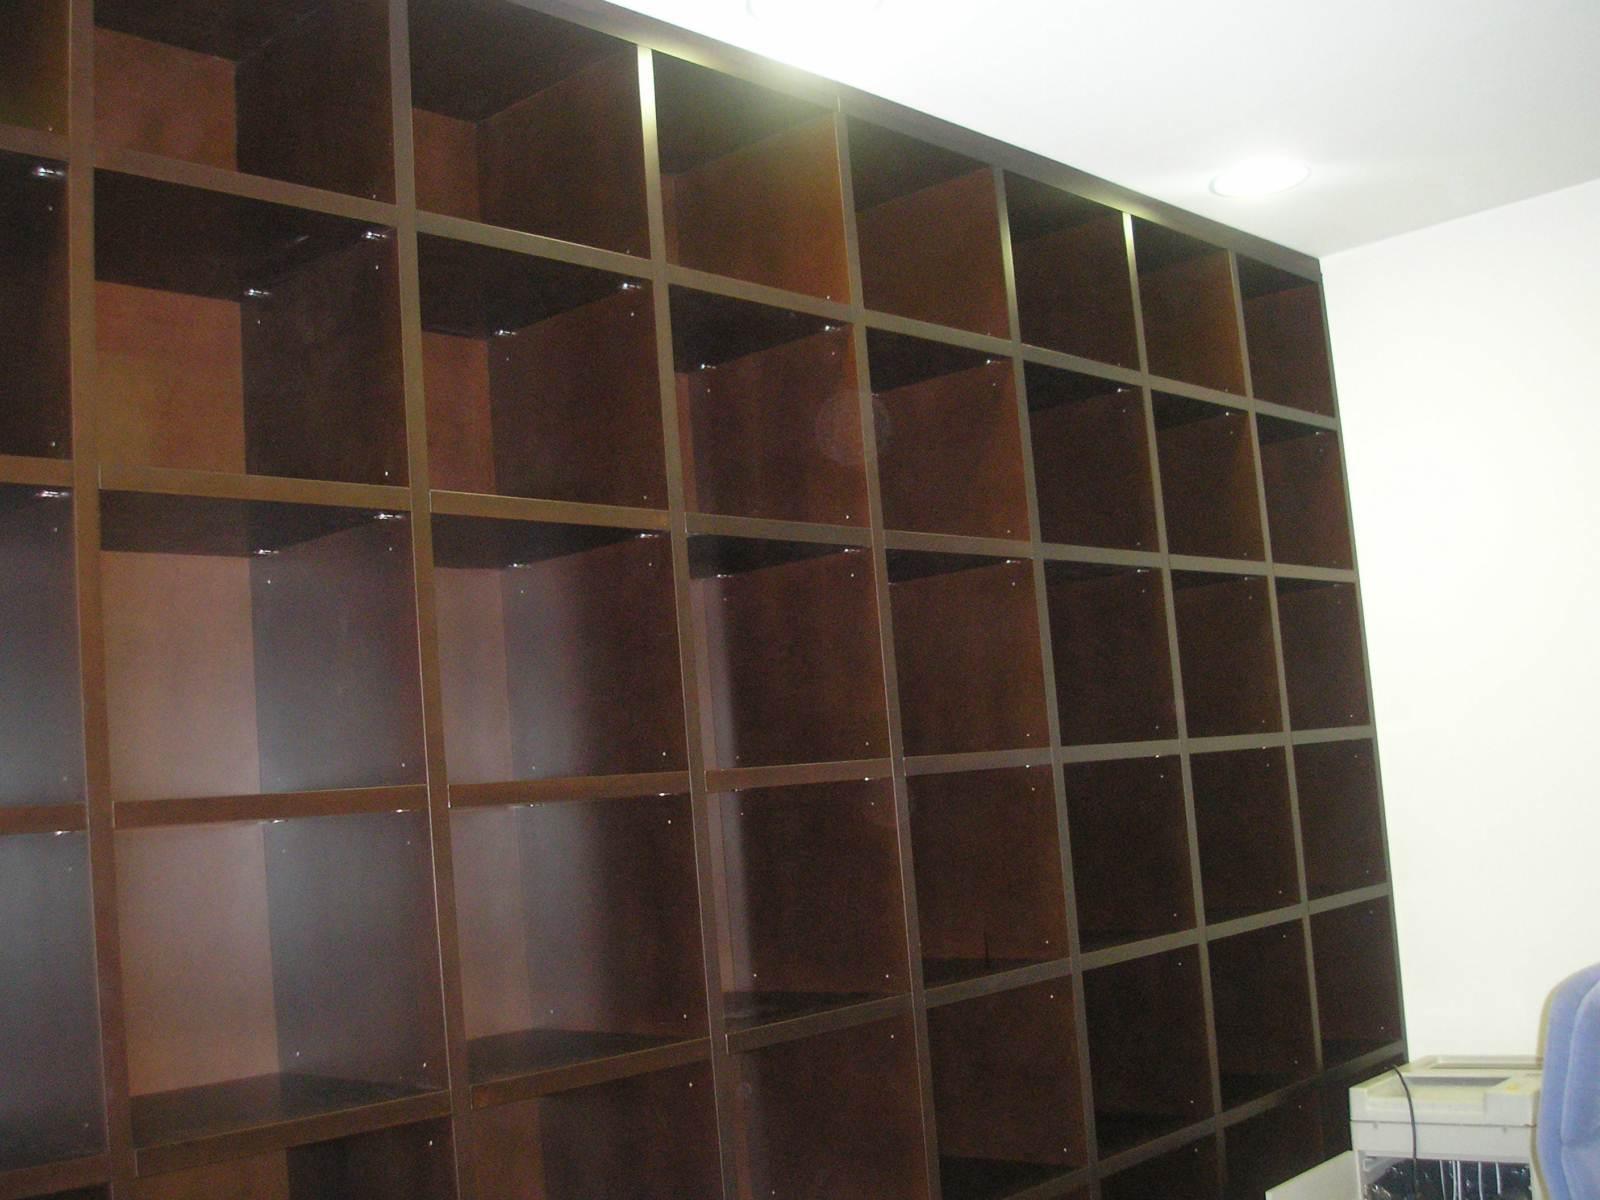 Biblioteca para despacho de abogados muebles cansado - Fotos despachos abogados ...